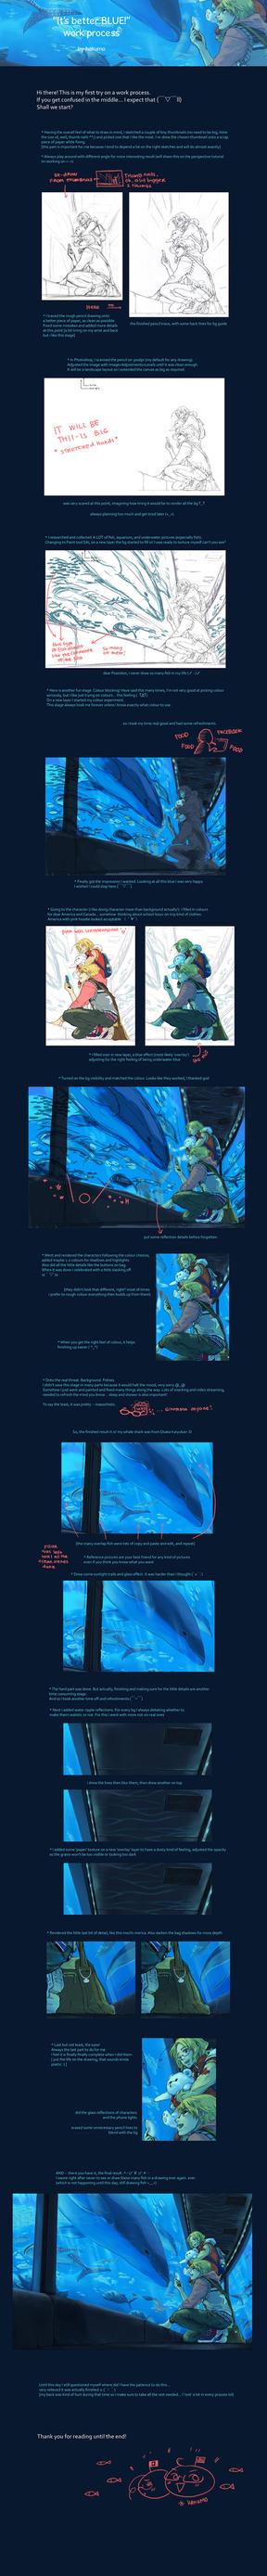 'It's better Blue' Work process by hakumo